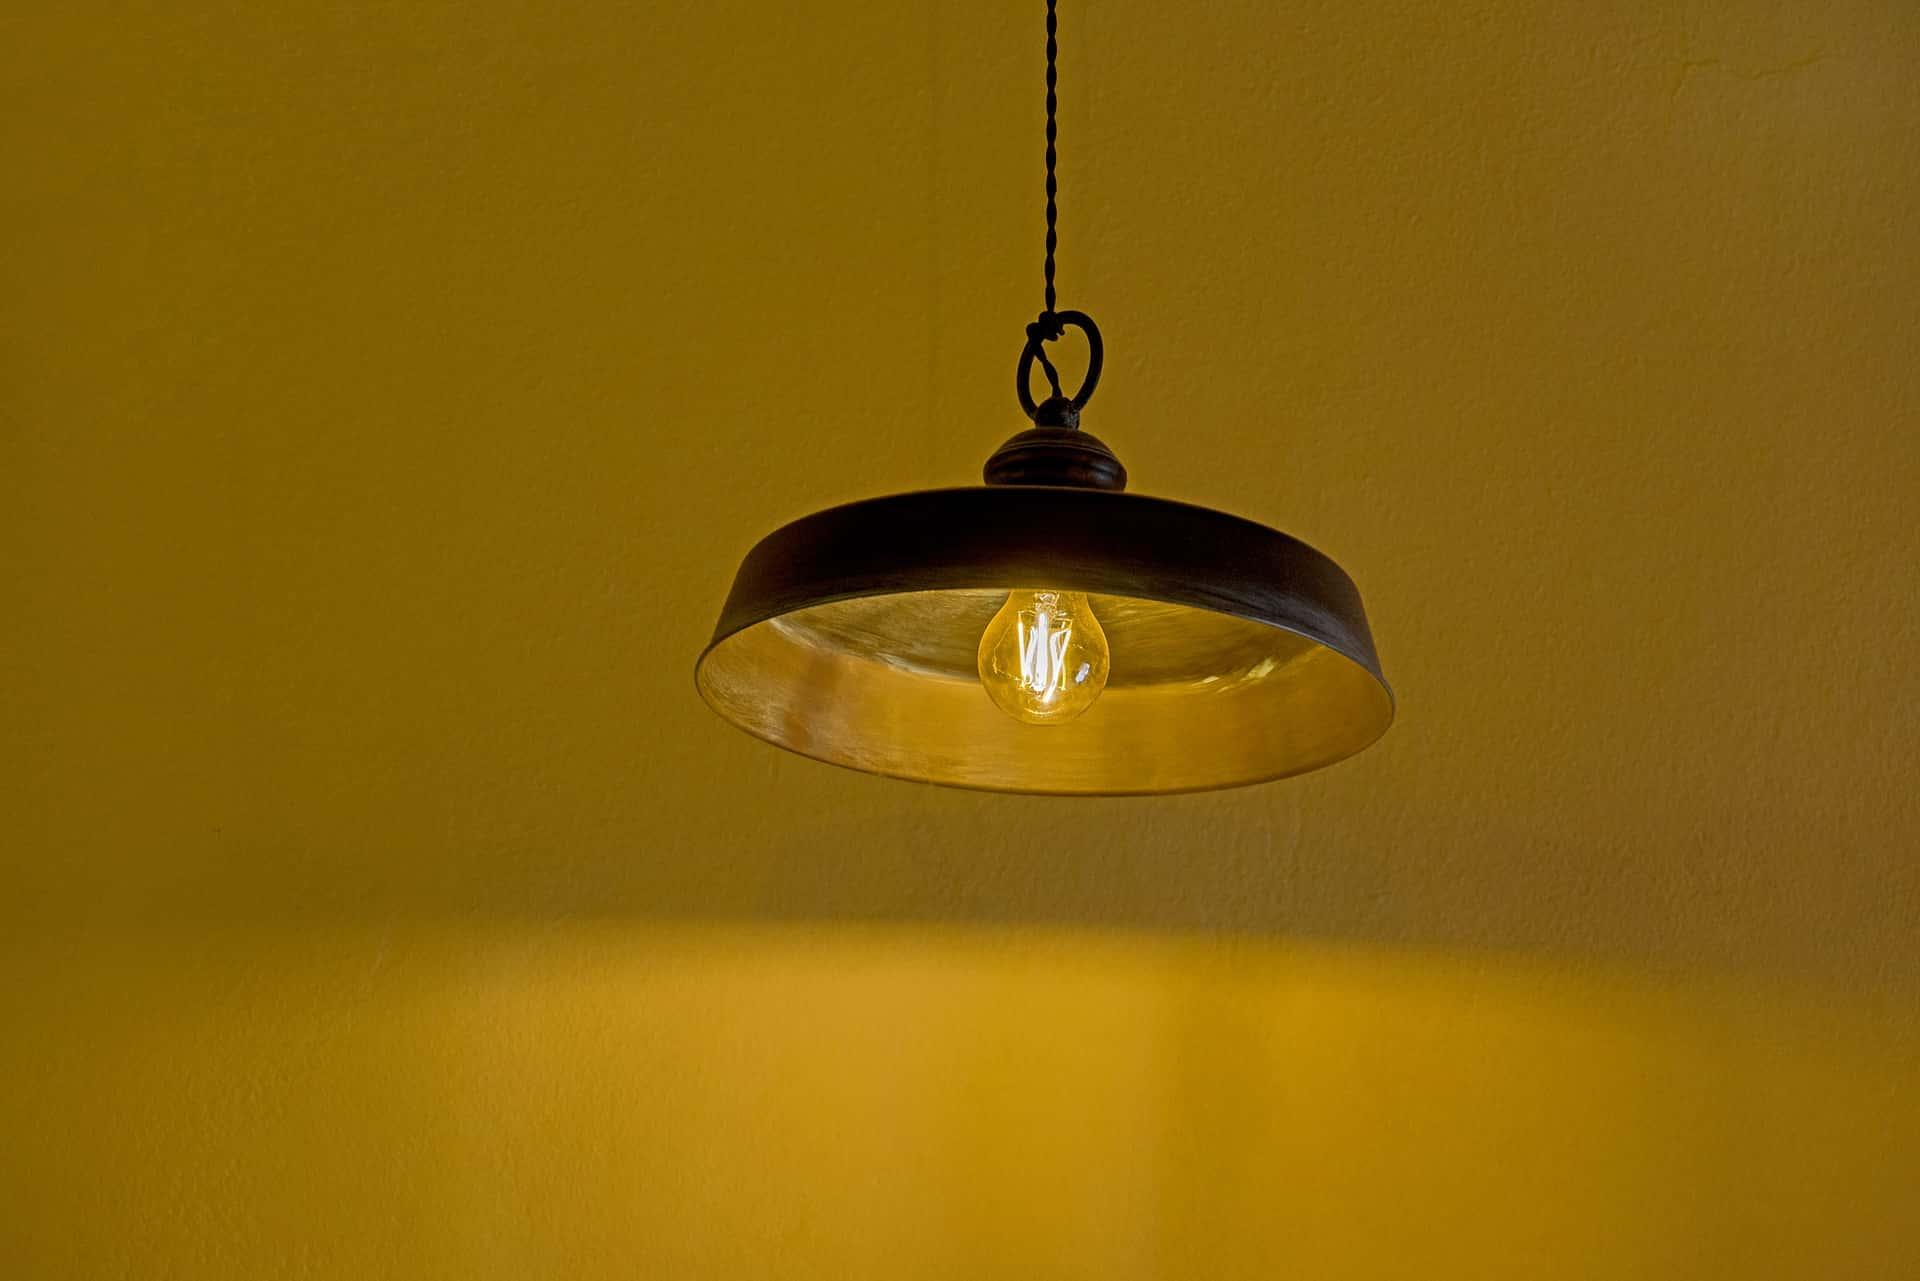 Beli Lampu Di Arsitag